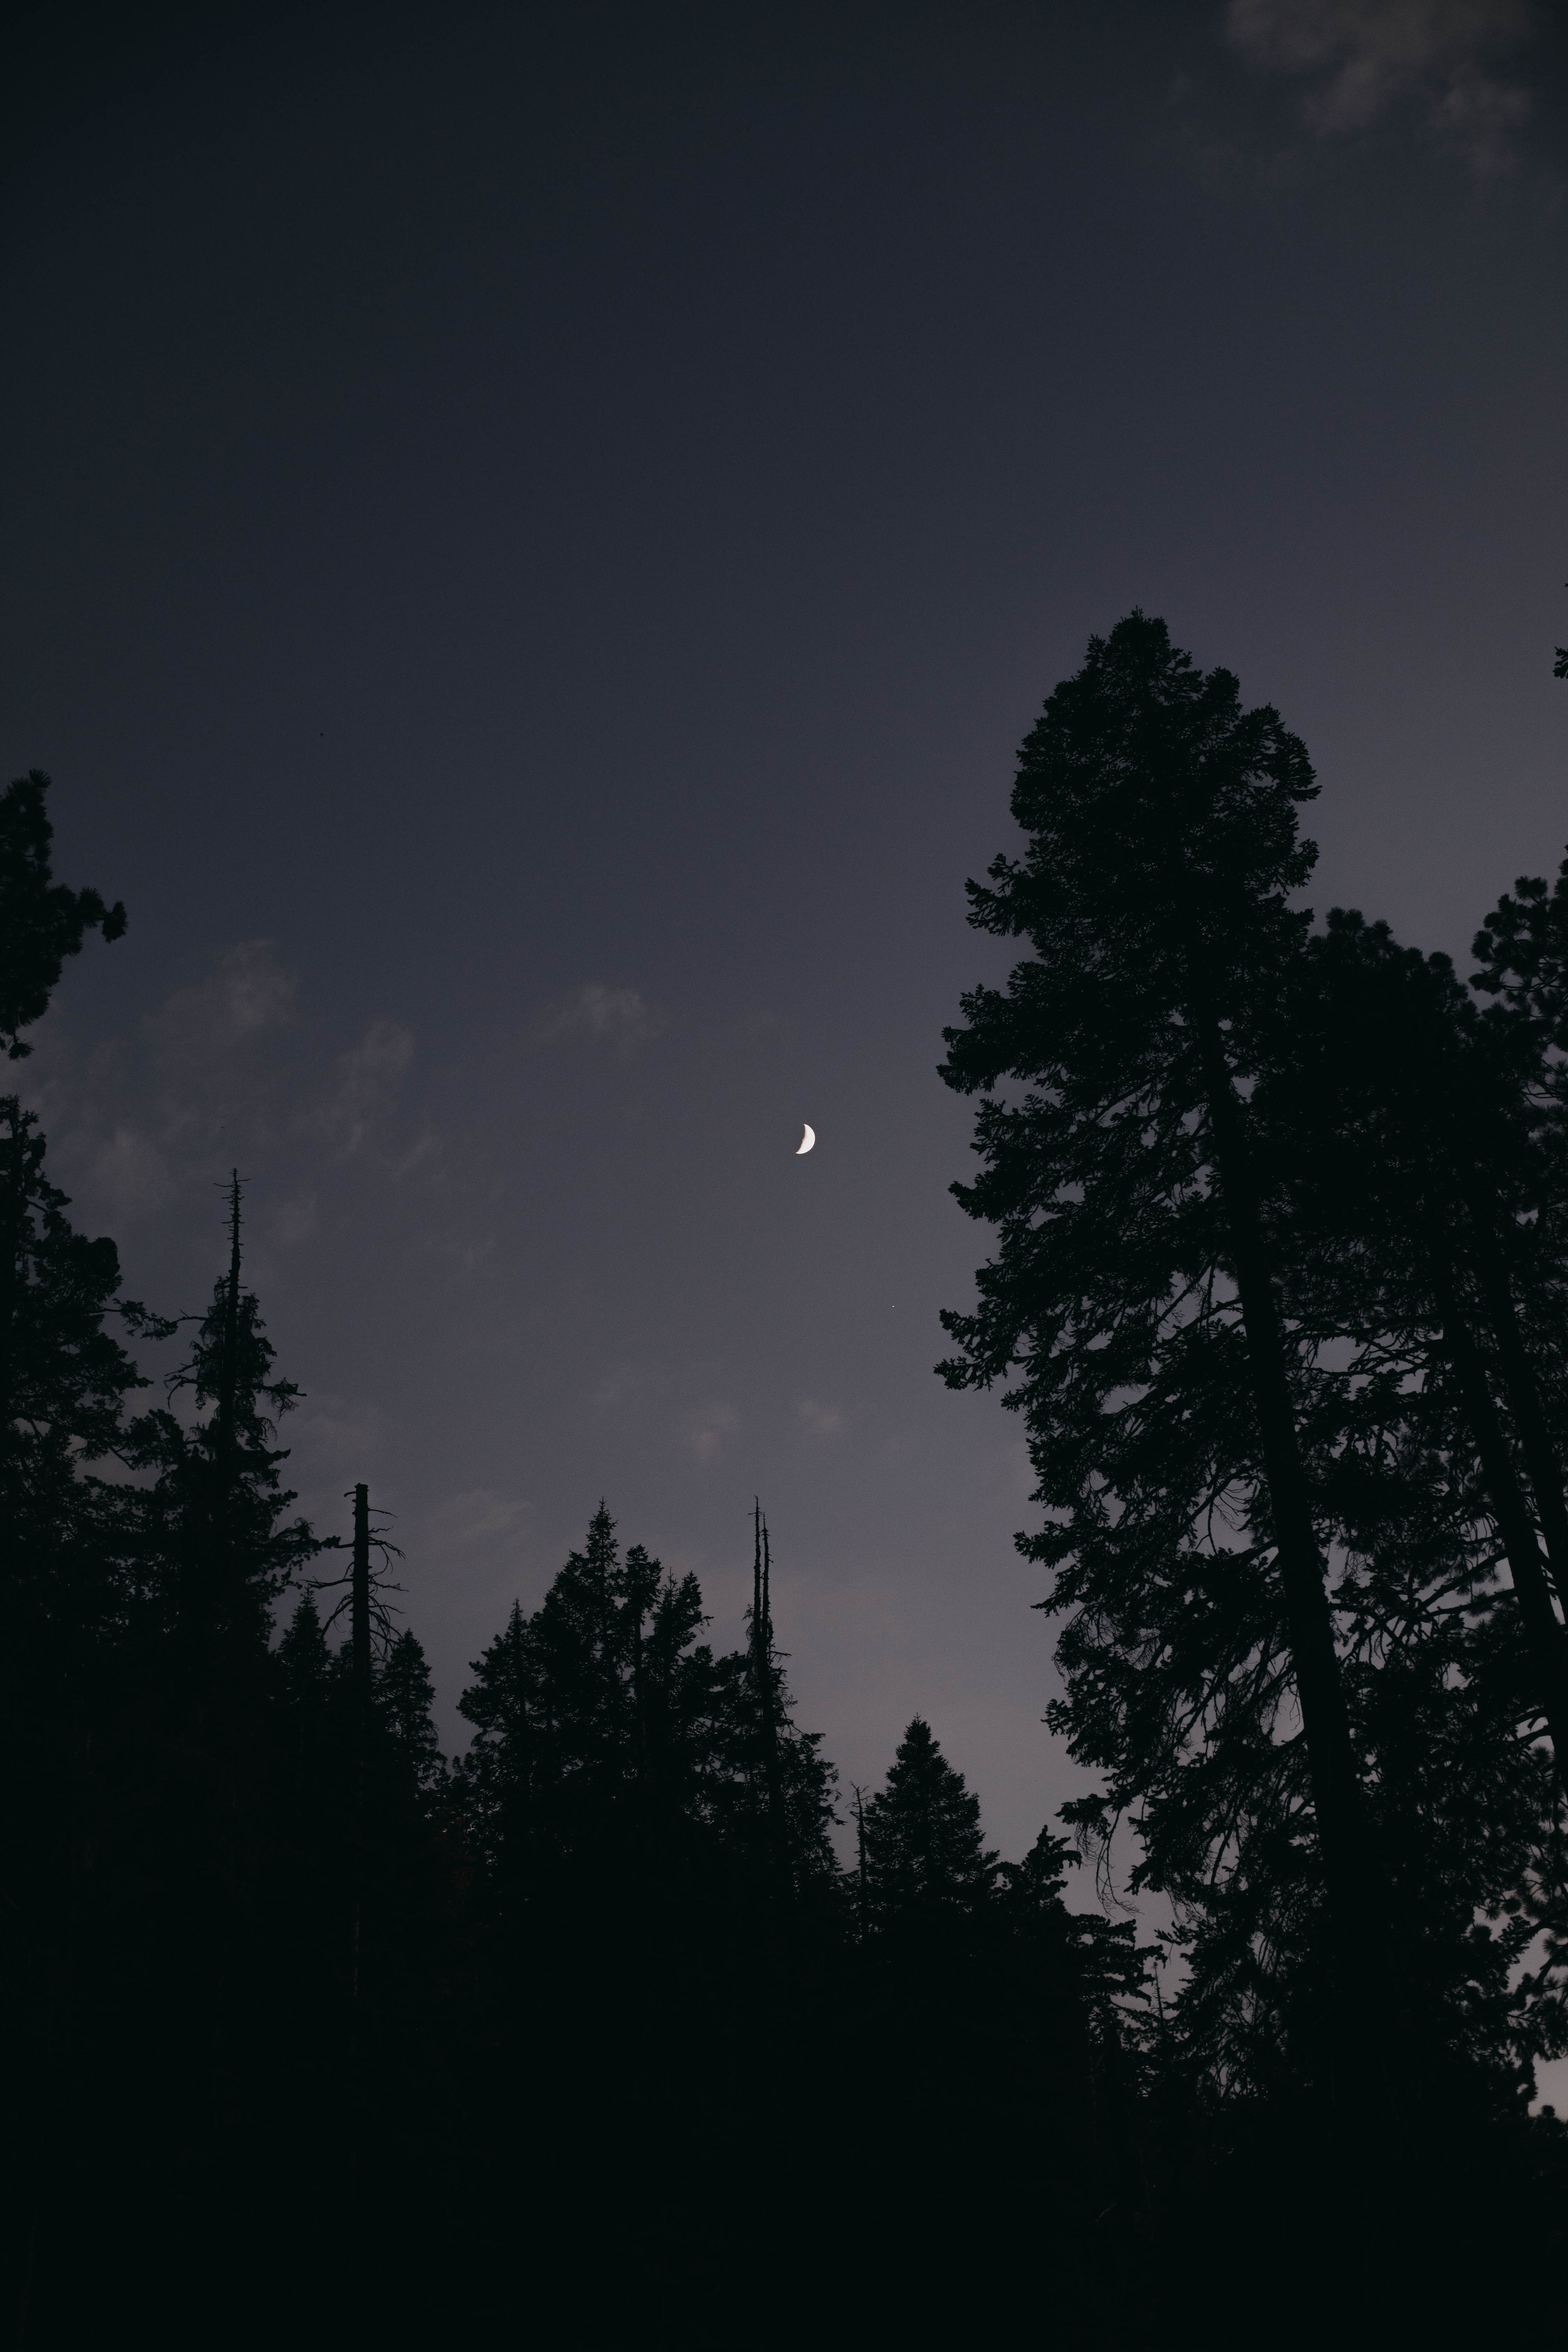 13. Sequoia National Park